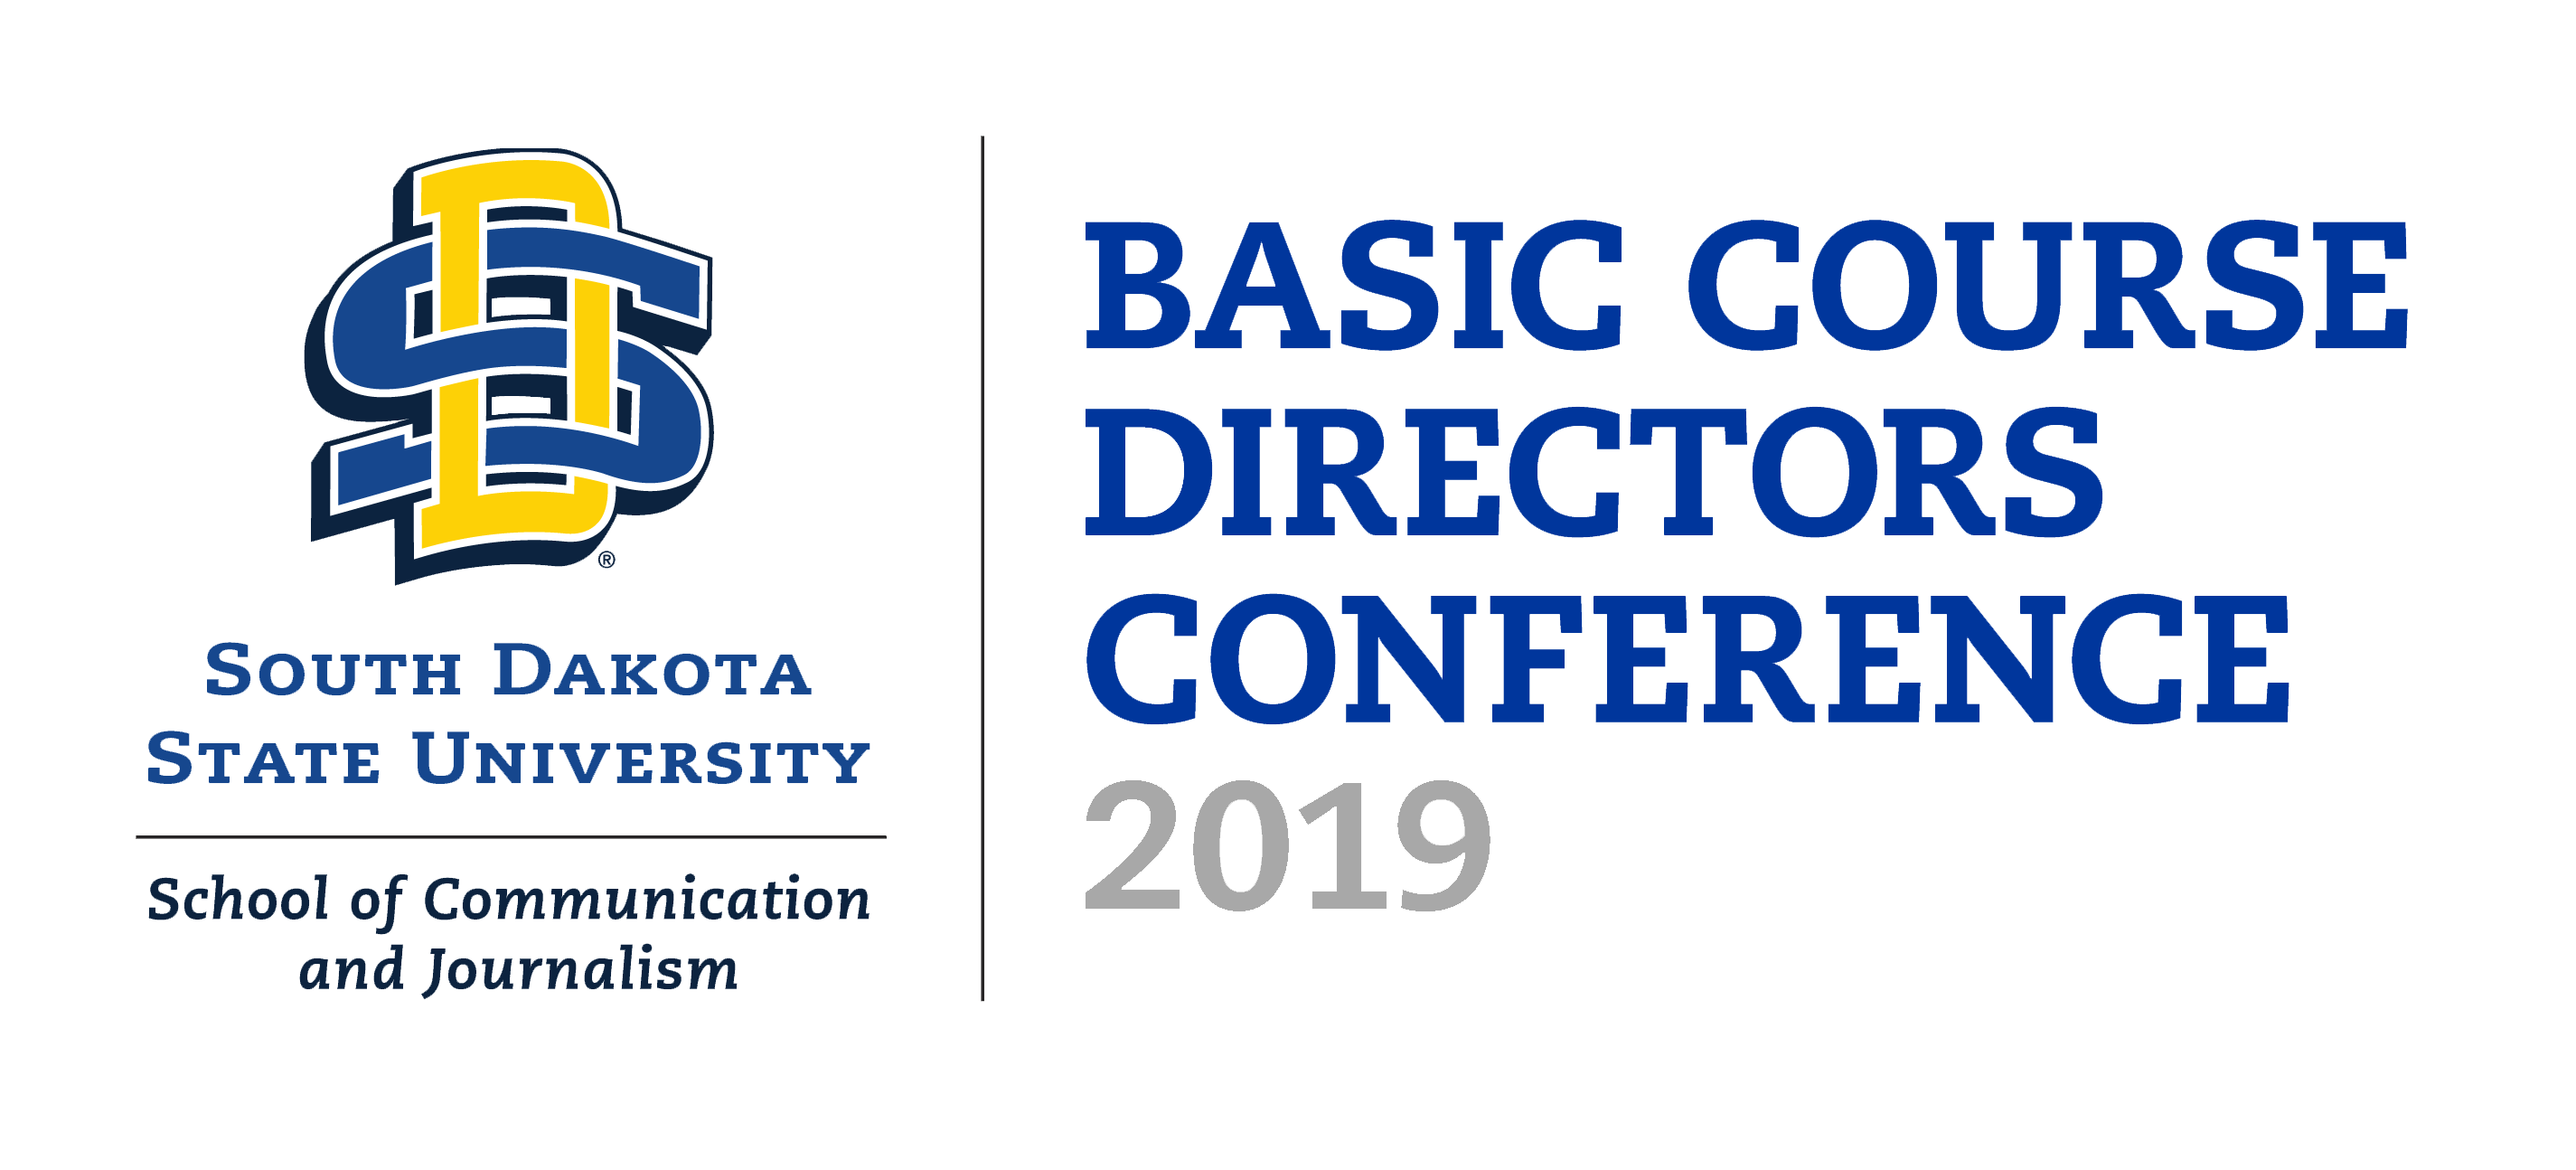 Basic Course Directors Conference 2019   South Dakota State Intended For South Dakota State University 2020 Academic Calendar